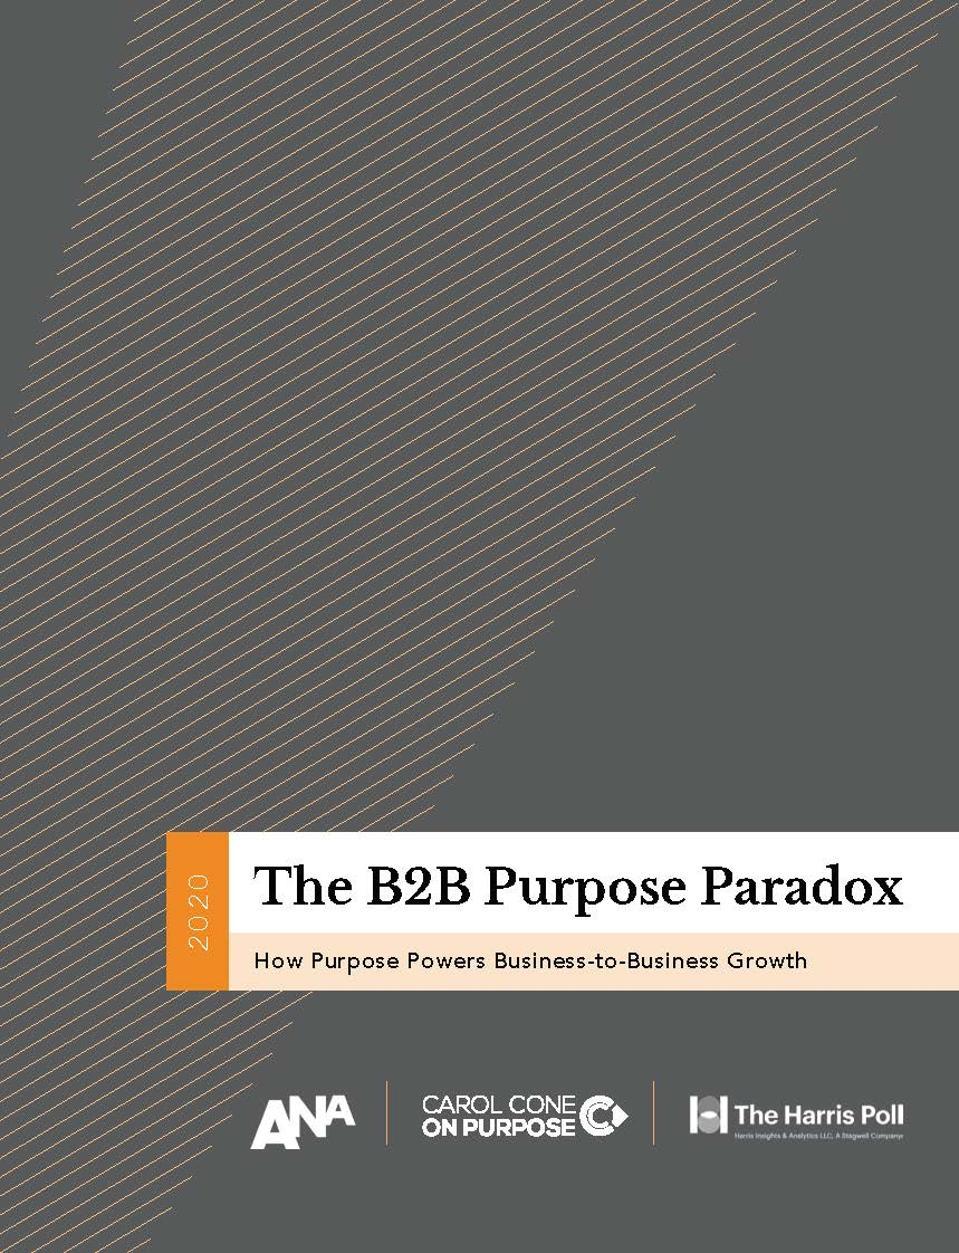 ANA, Carol Cone on Purpose and The Harris Report's ″The B2B Purpose Paradox″